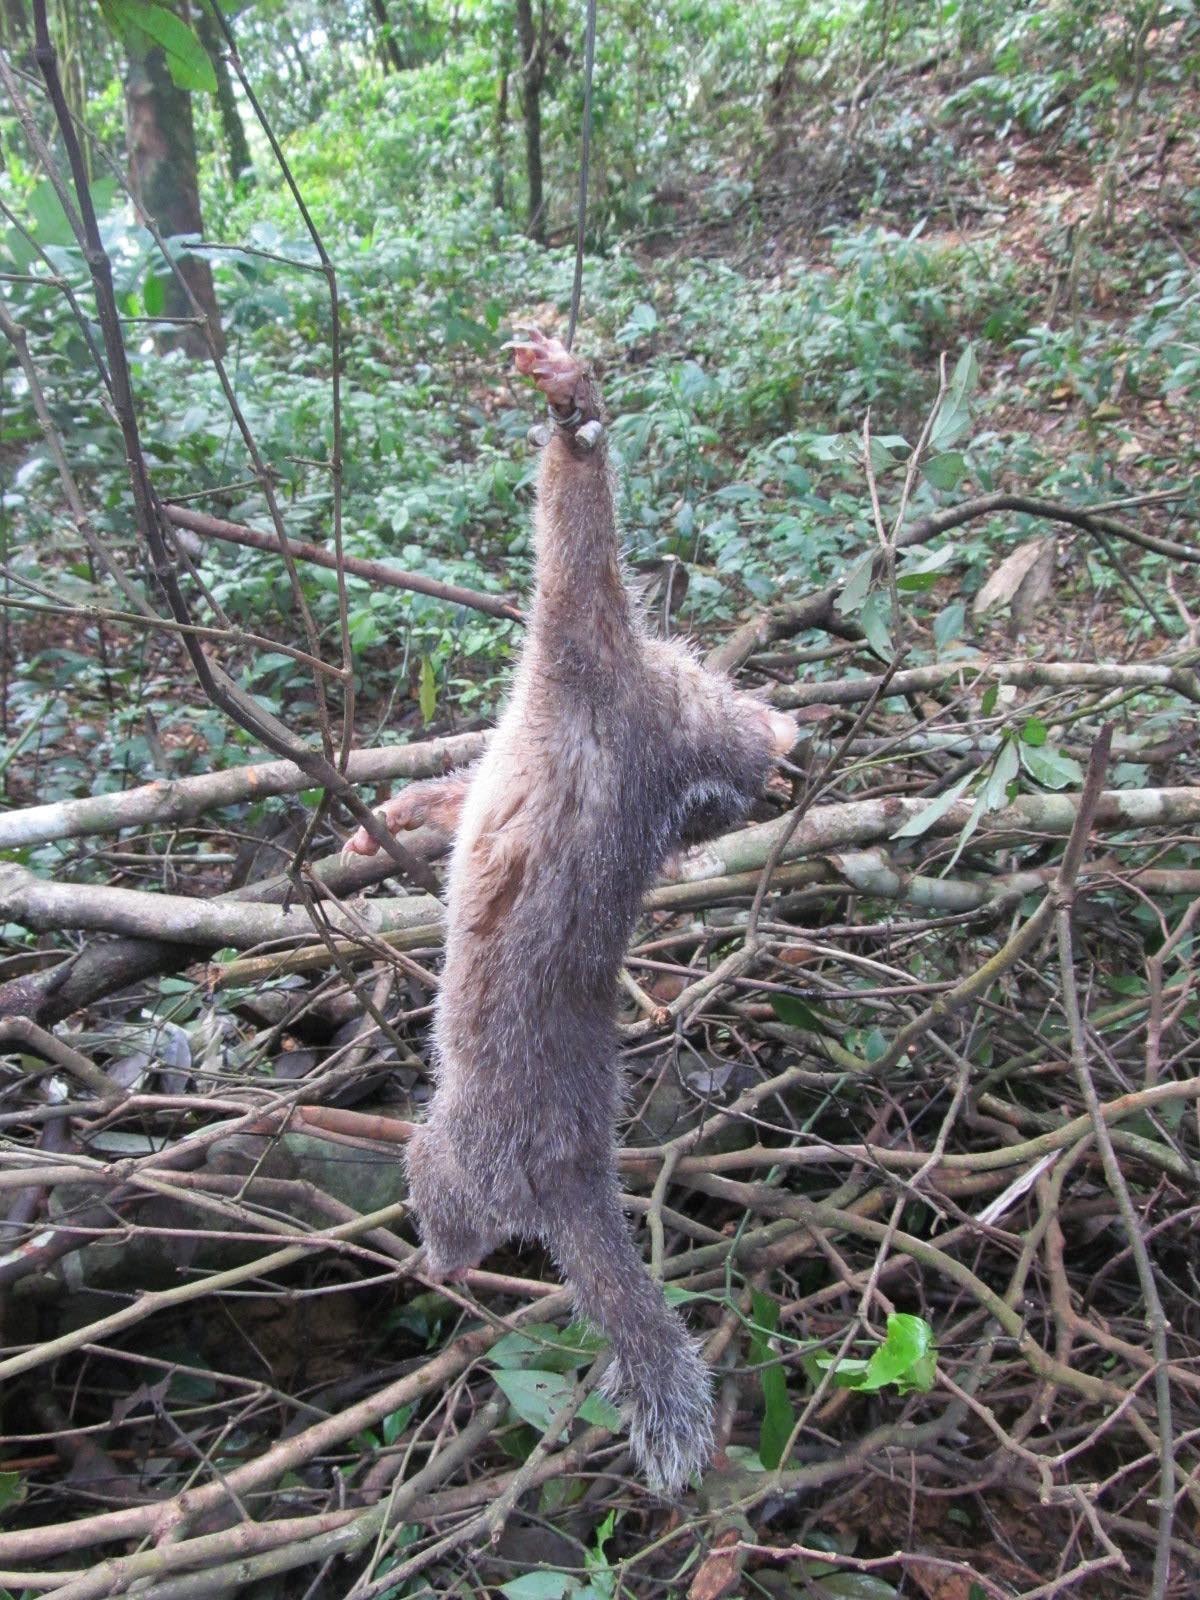 Ferret Badger caught in snare.